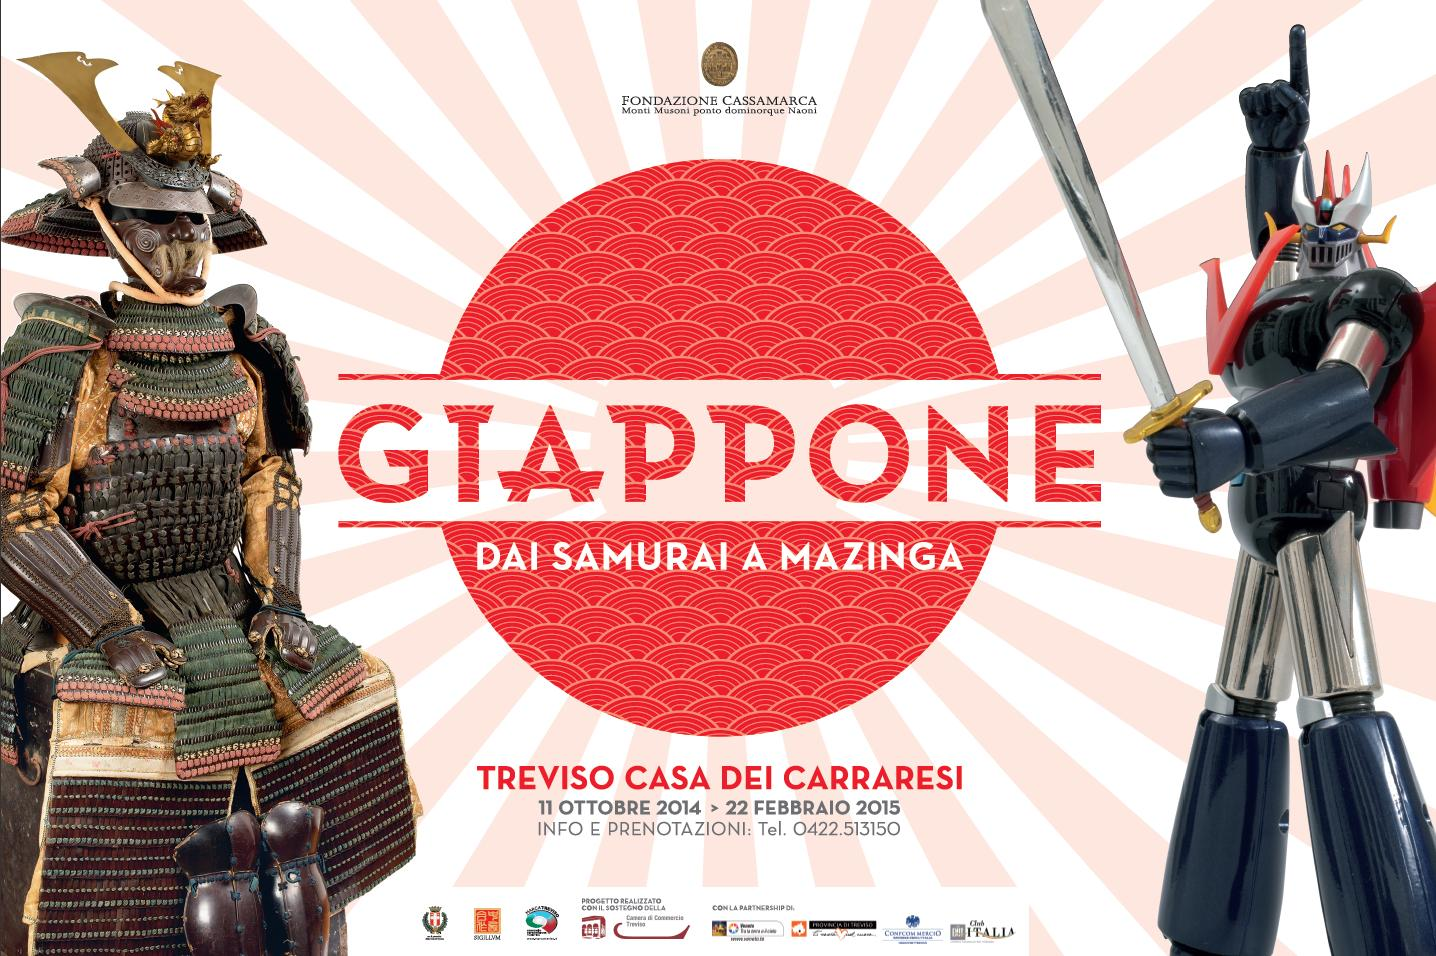 Giappone: dai Samurai a Mazinga - Dall'11 ottobre a Treviso